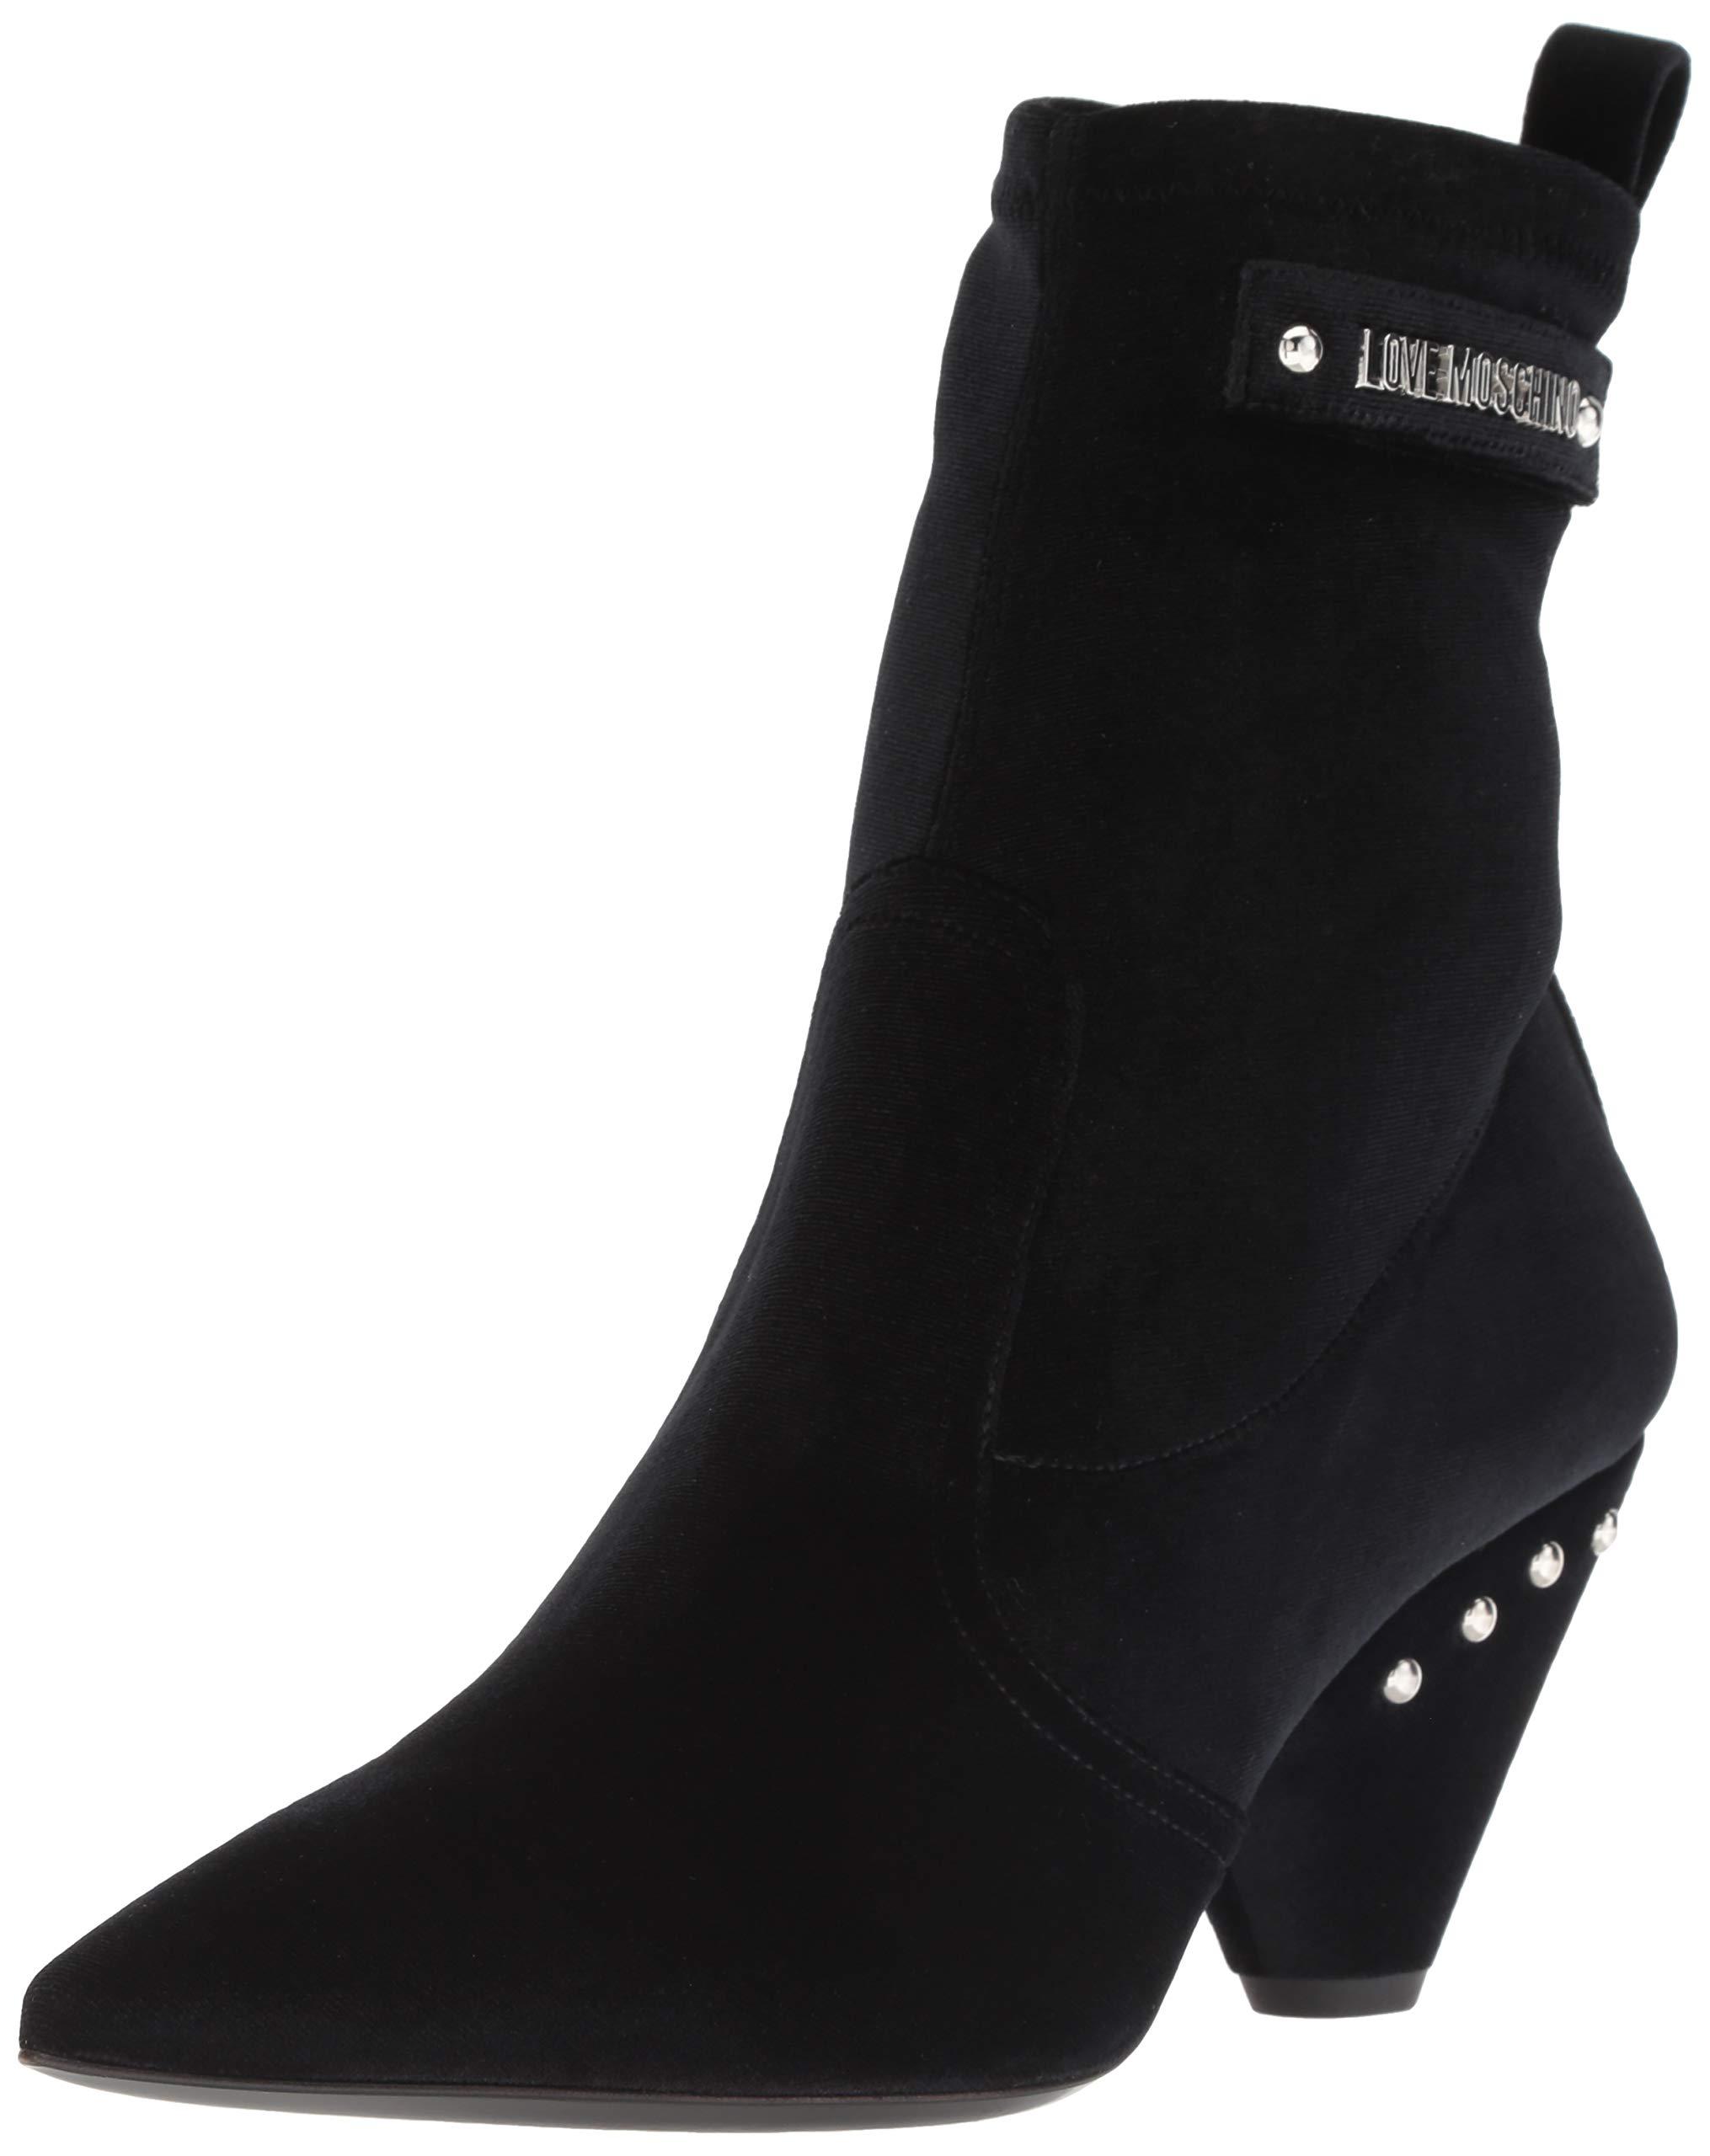 Love Moschino Women's JA21077C06JG100A Uniform Dress Shoe Black 41 Regular EU (11 US)